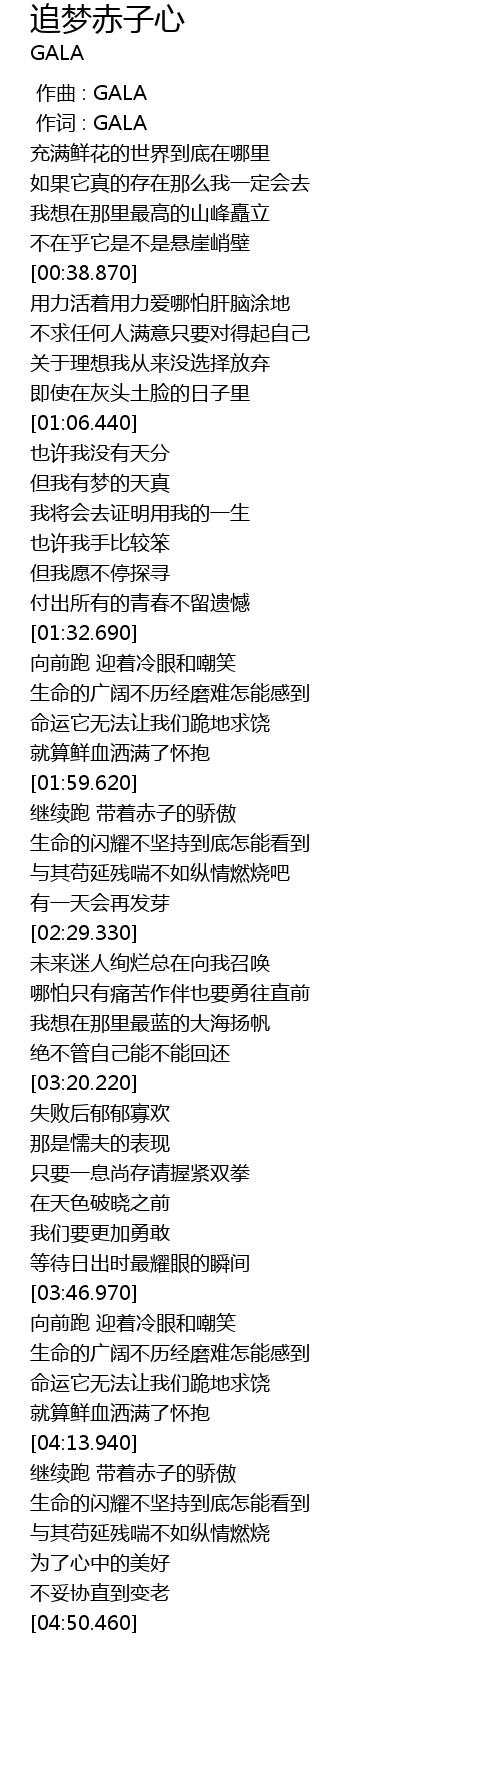 追夢赤子心 zhui meng chi zi xin Lyrics - Follow Lyrics